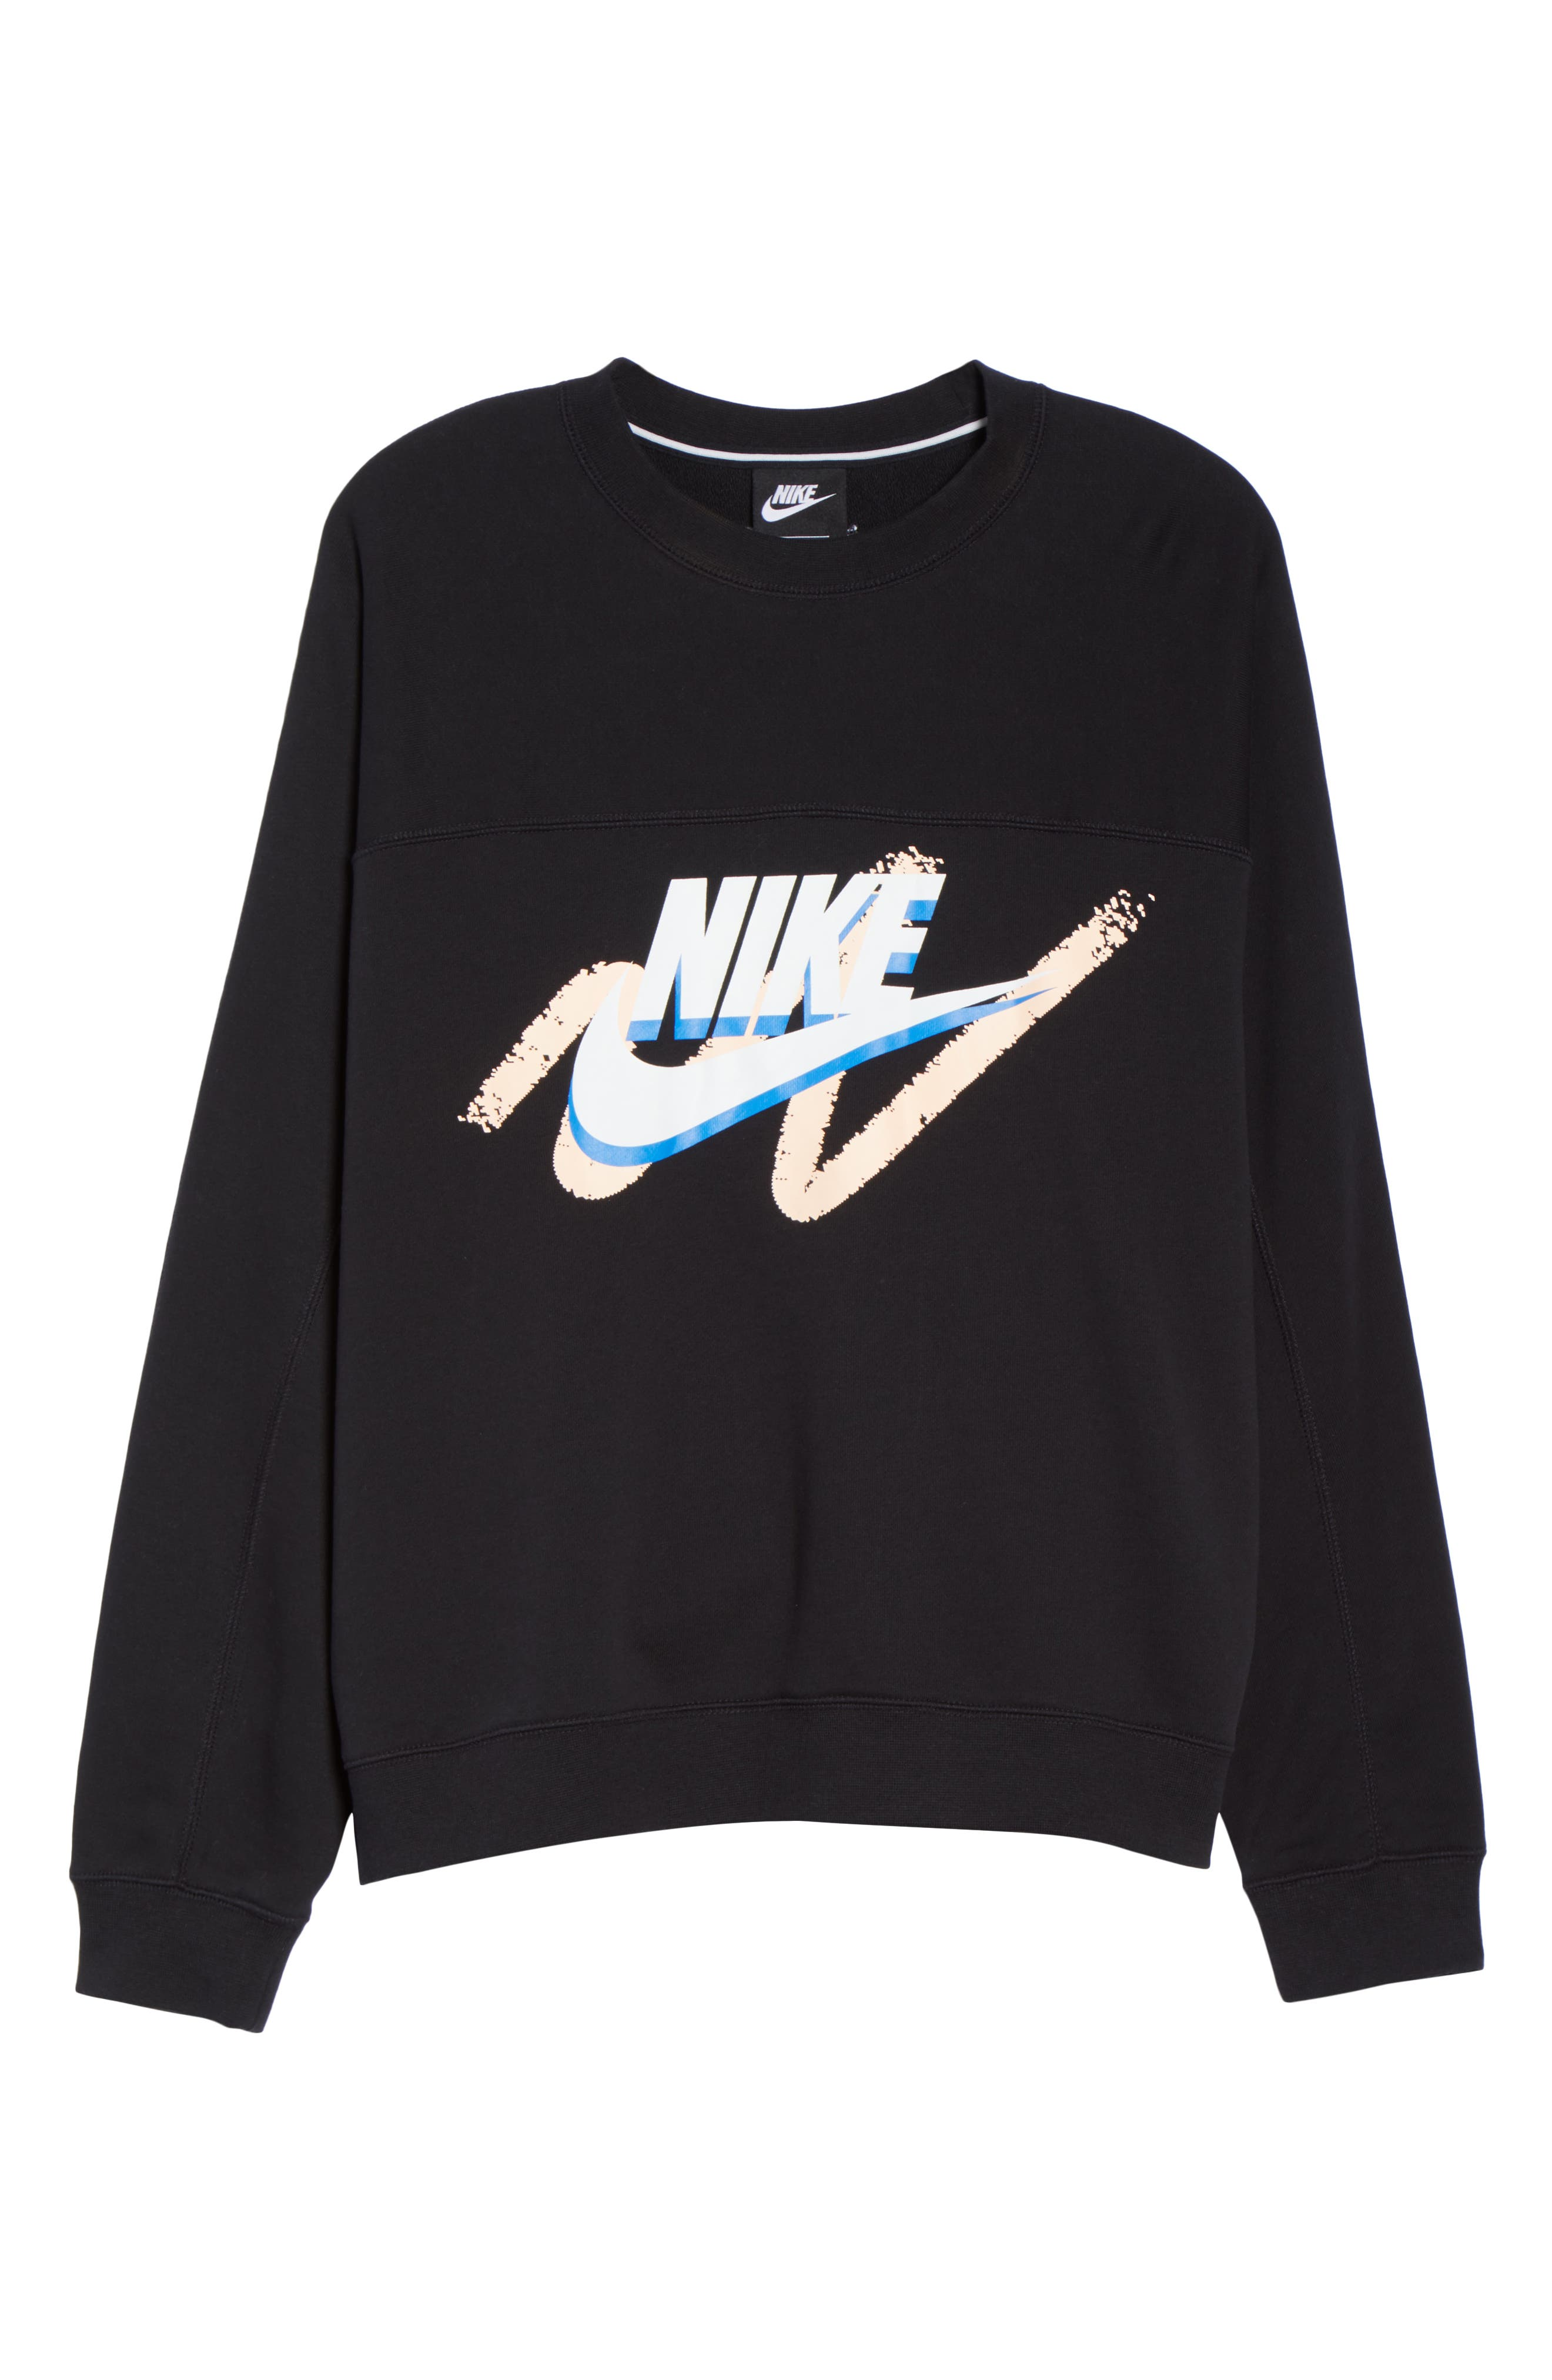 Archive Sweatshirt,                             Alternate thumbnail 7, color,                             BLACK/ BLACK/ BLACK